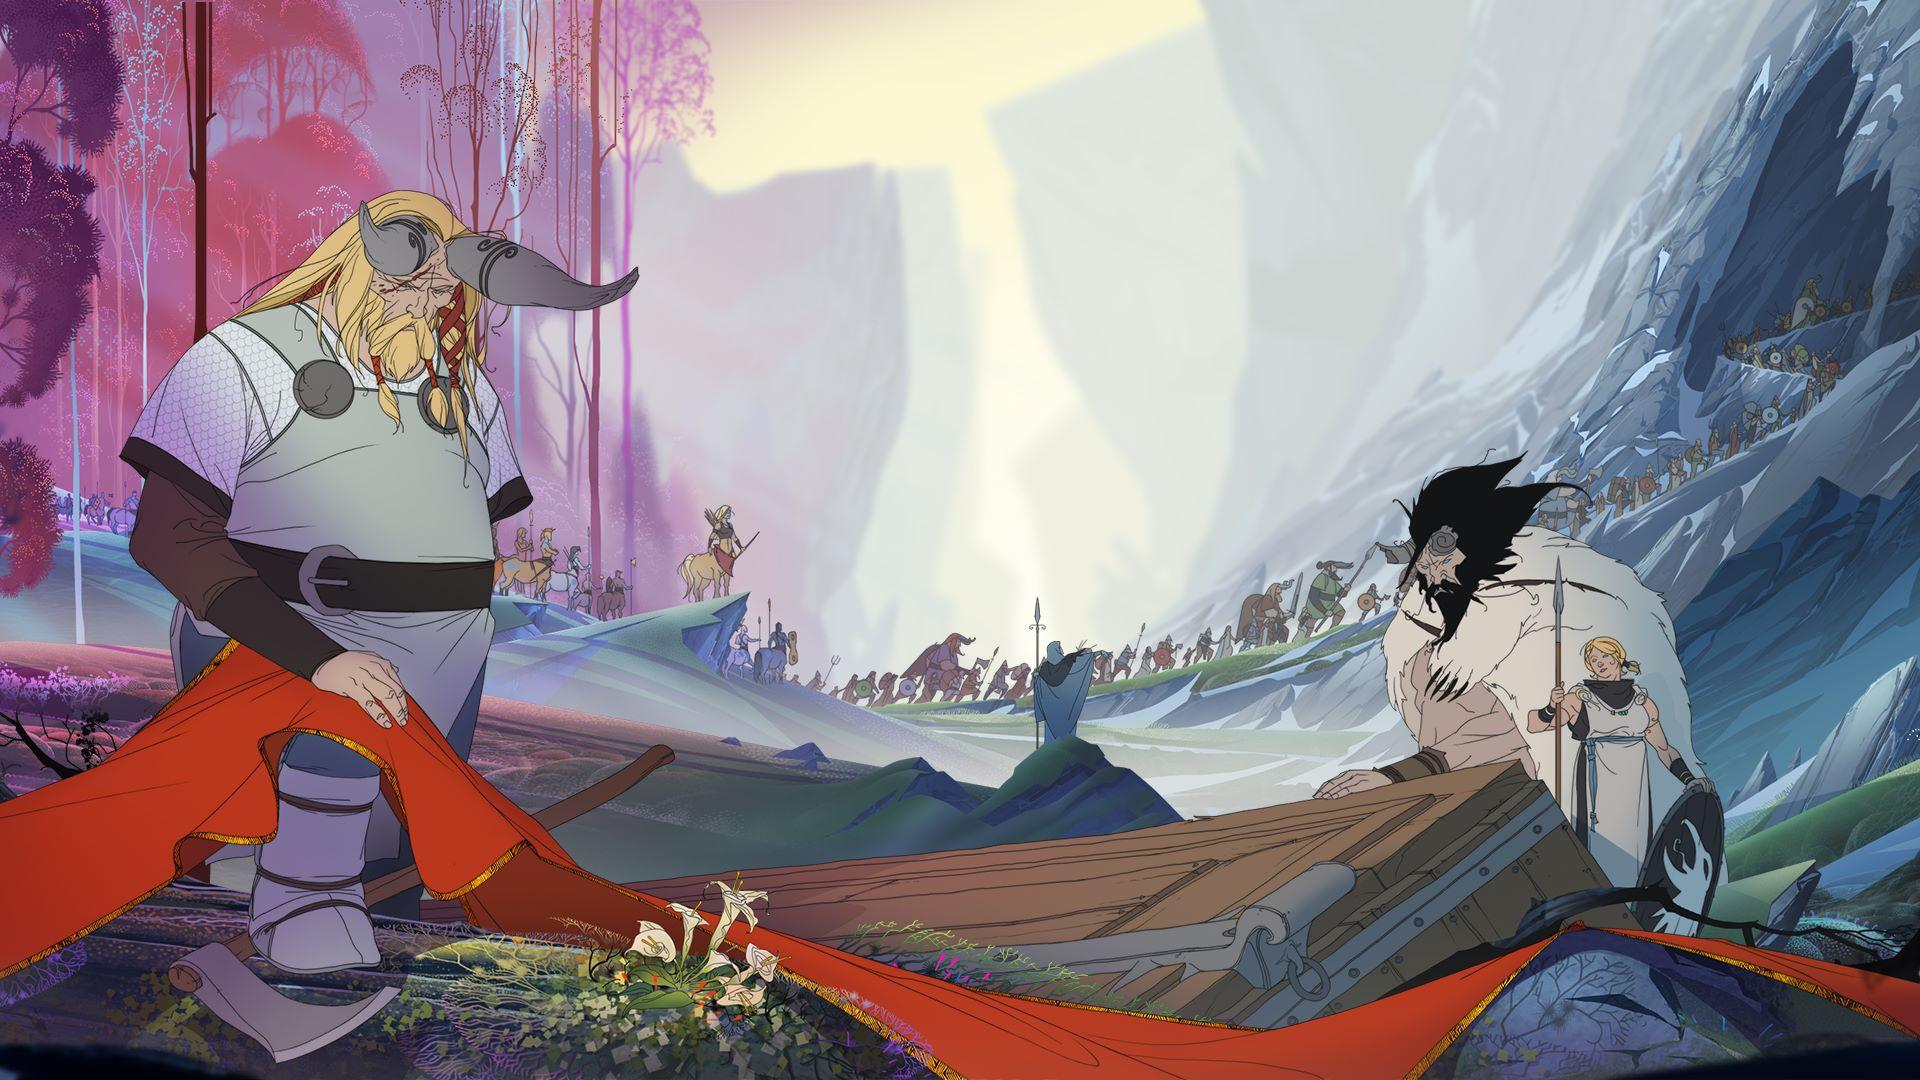 Banner Saga 2, by Stoic.